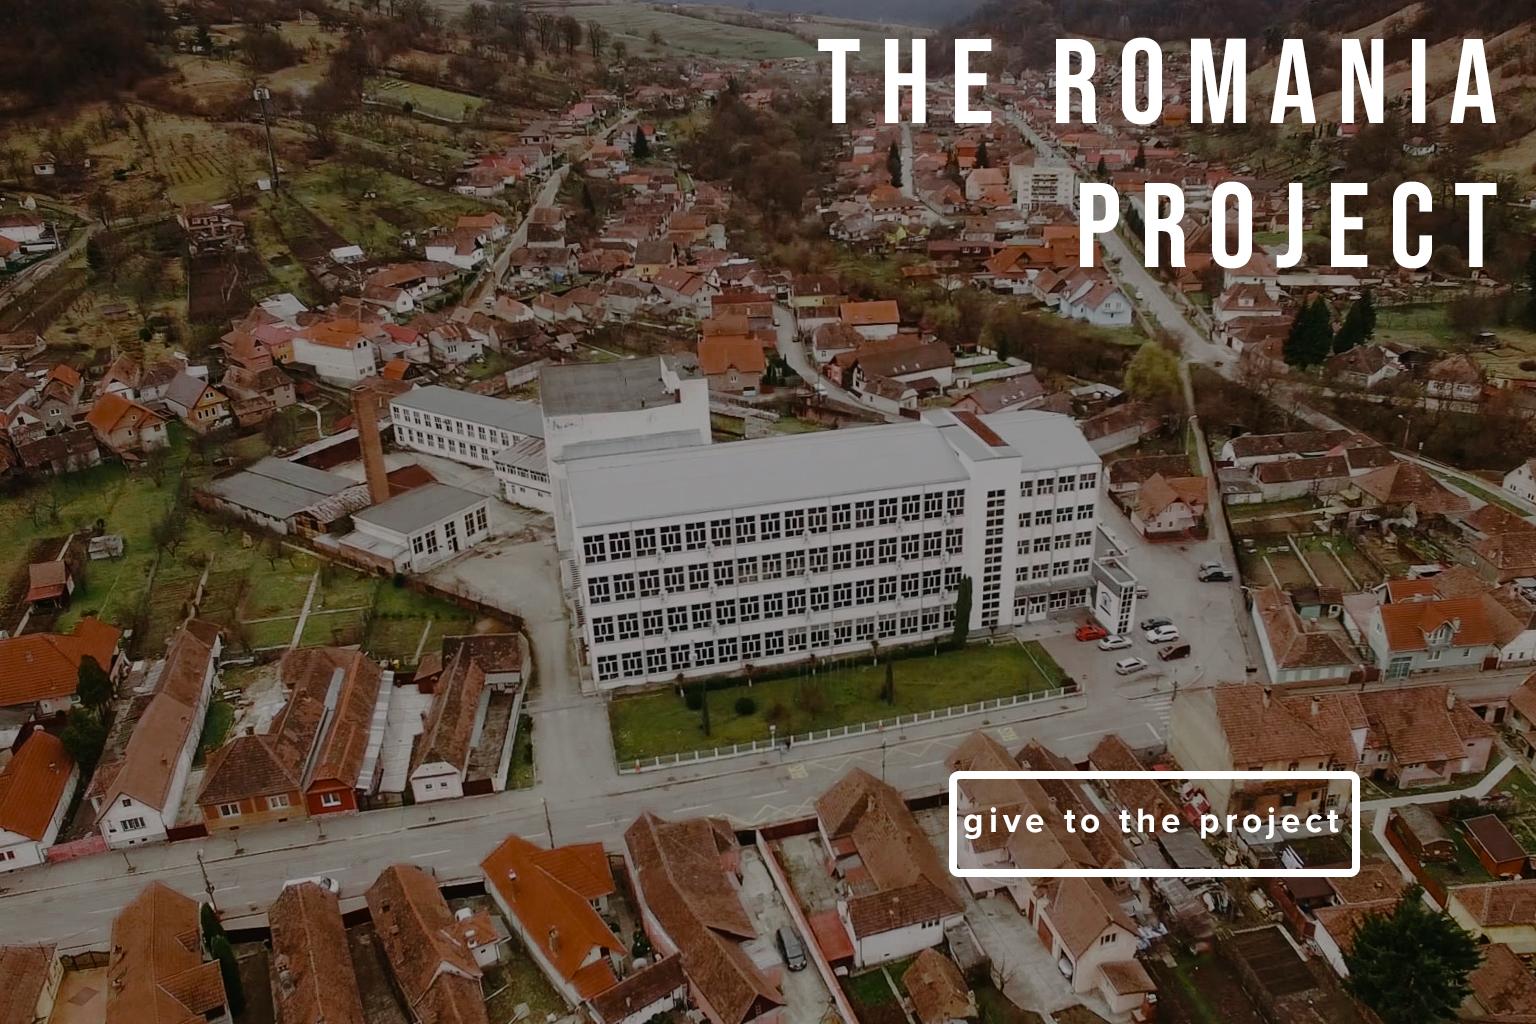 Romania-Basefinal.jpg